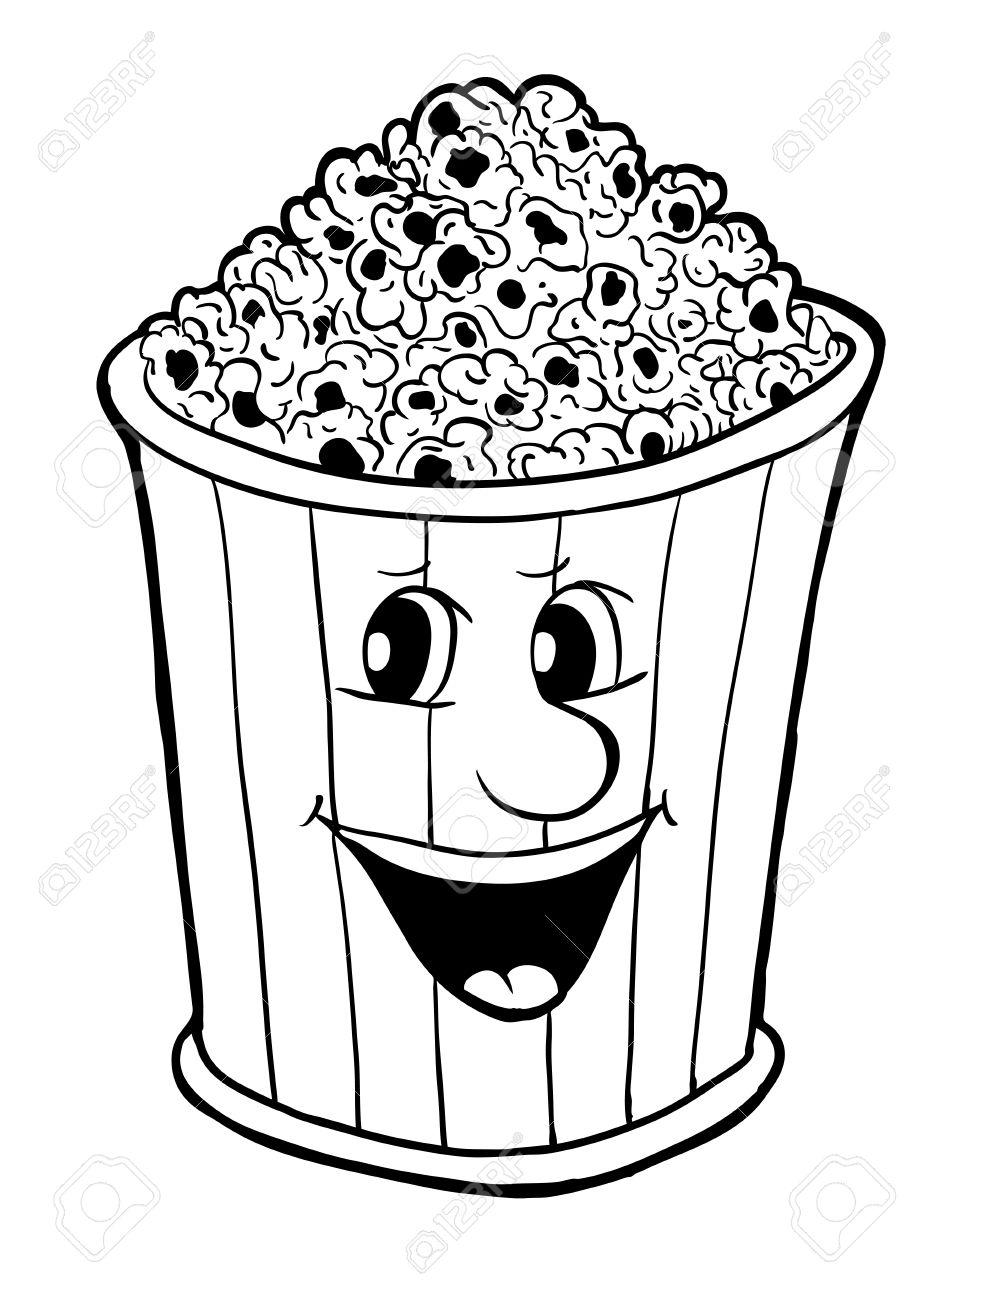 1002x1300 Bucket Of Popcorn, Vector Illustration, Coloring Book Royalty Free